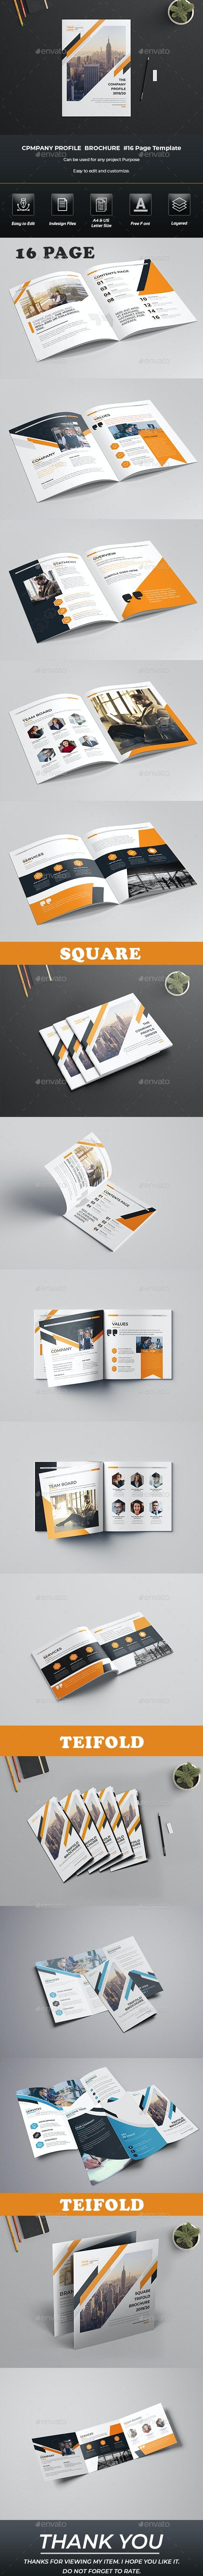 Company Profile Brochure Bundle Template - Print Templates